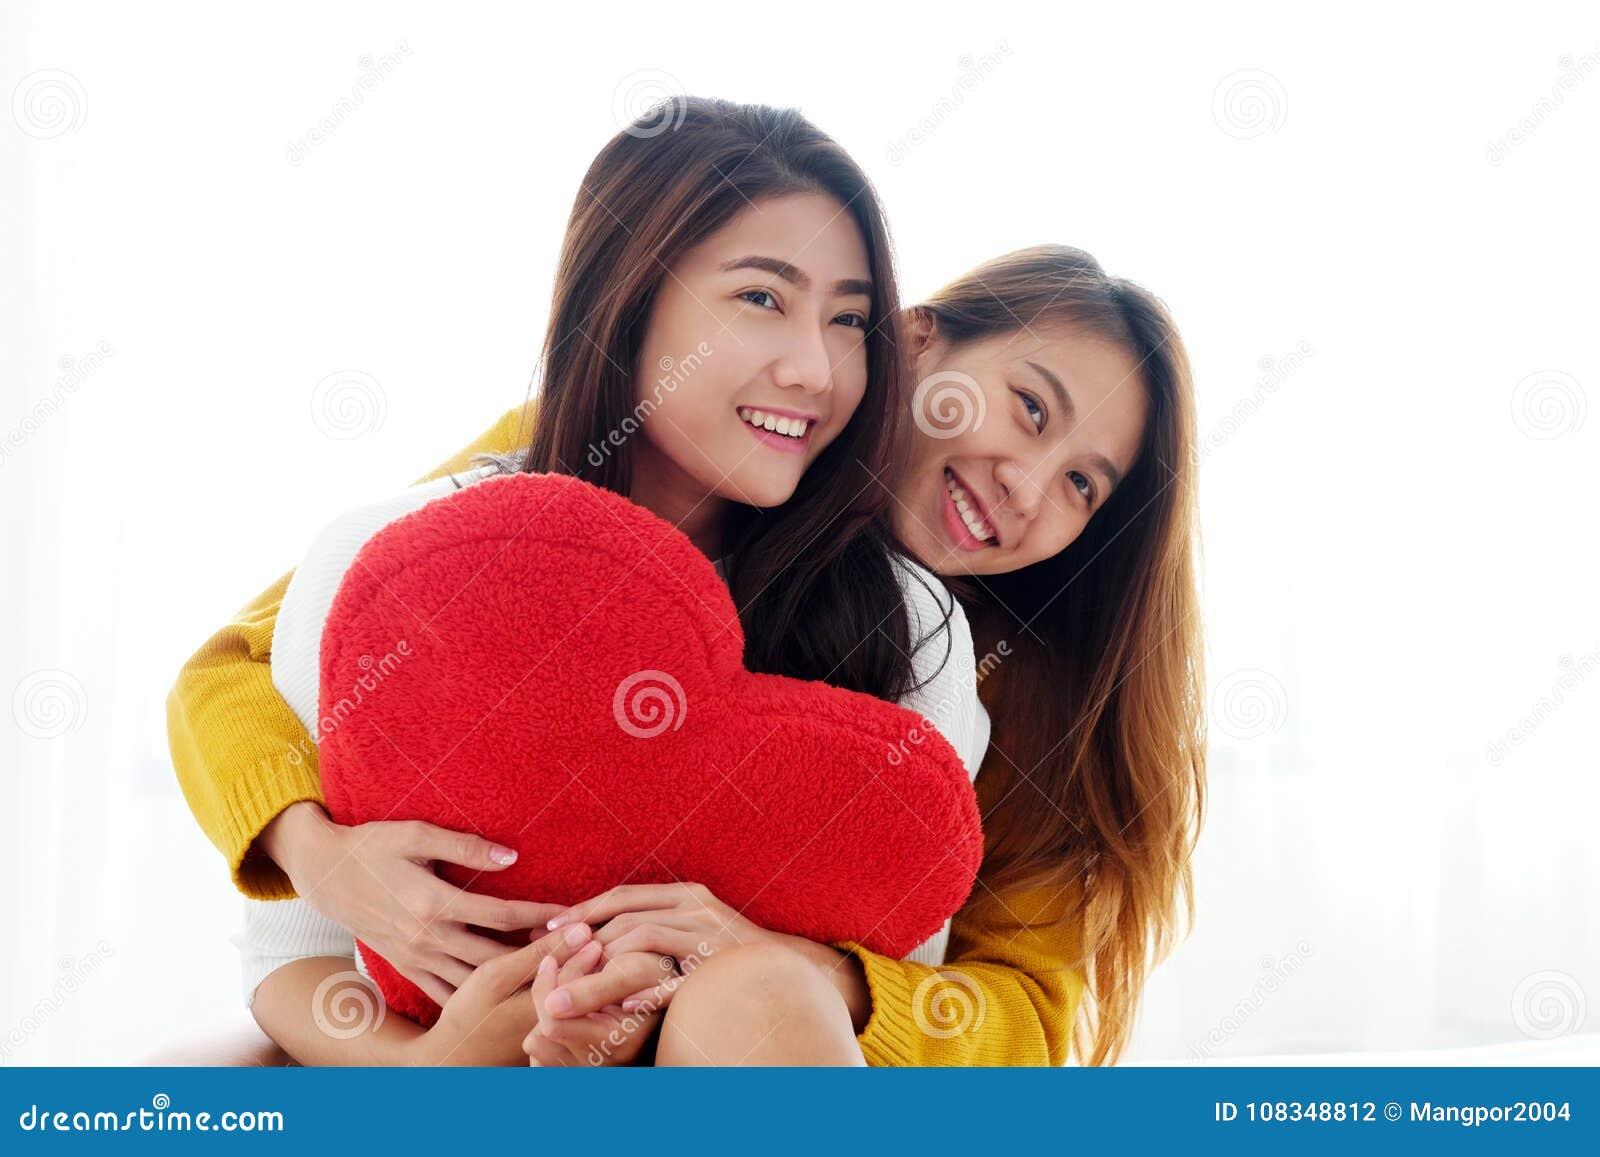 Cute young lesbians